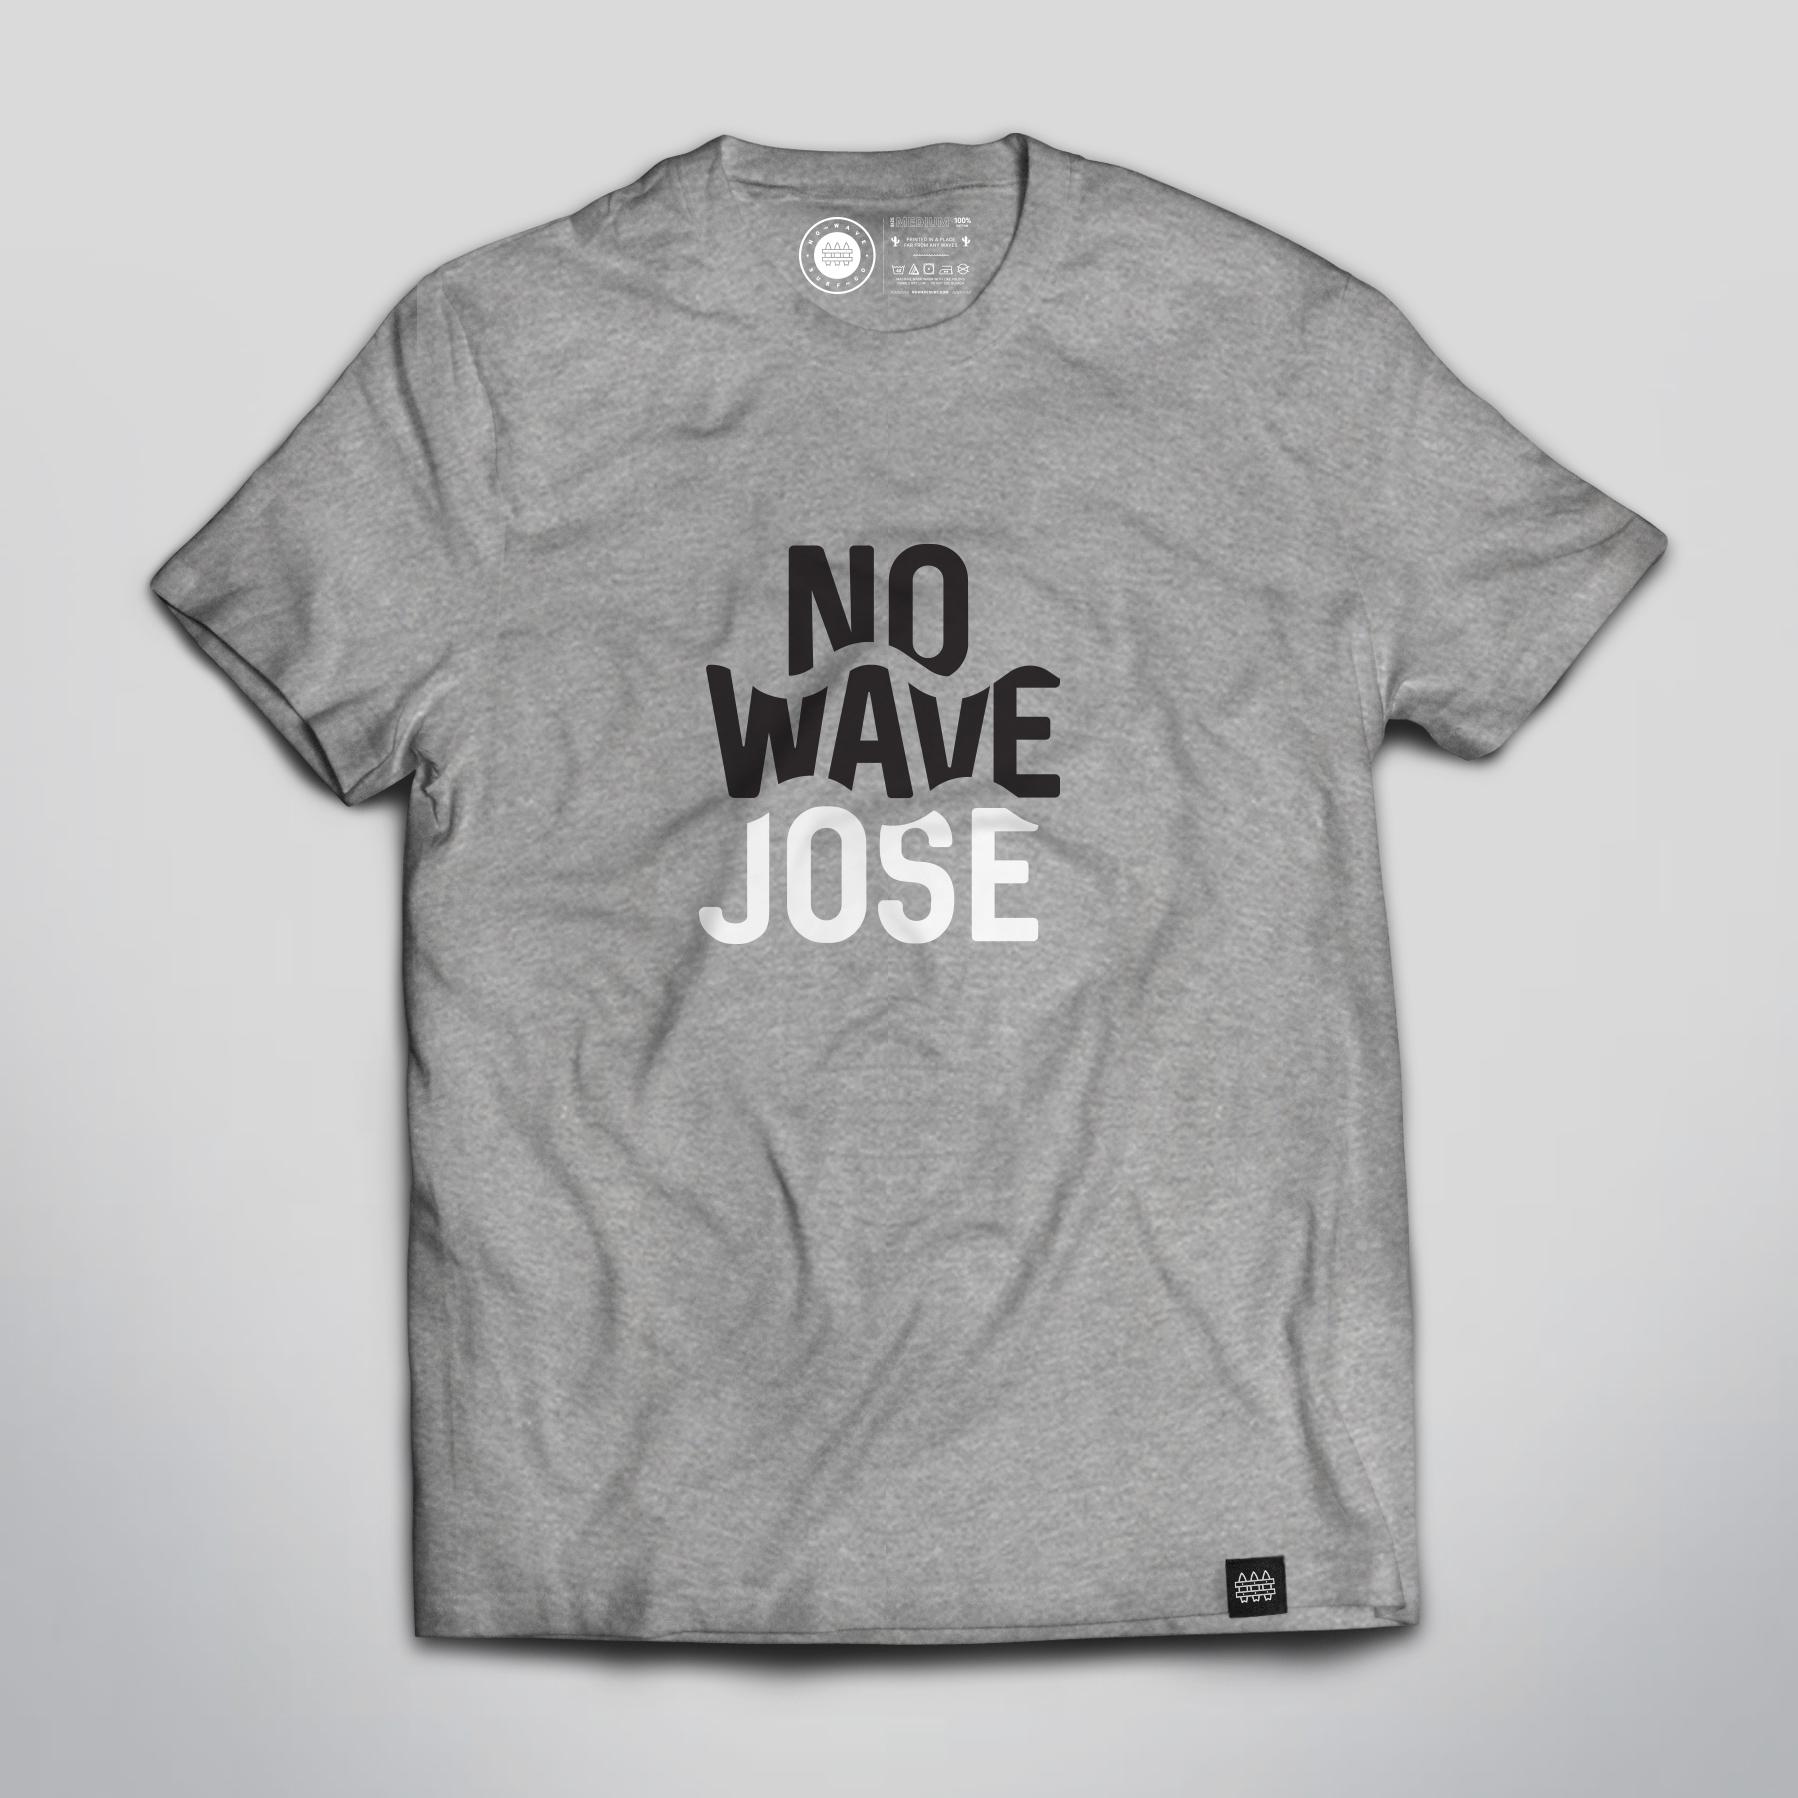 NO-WAVE-JOSE_1.jpg